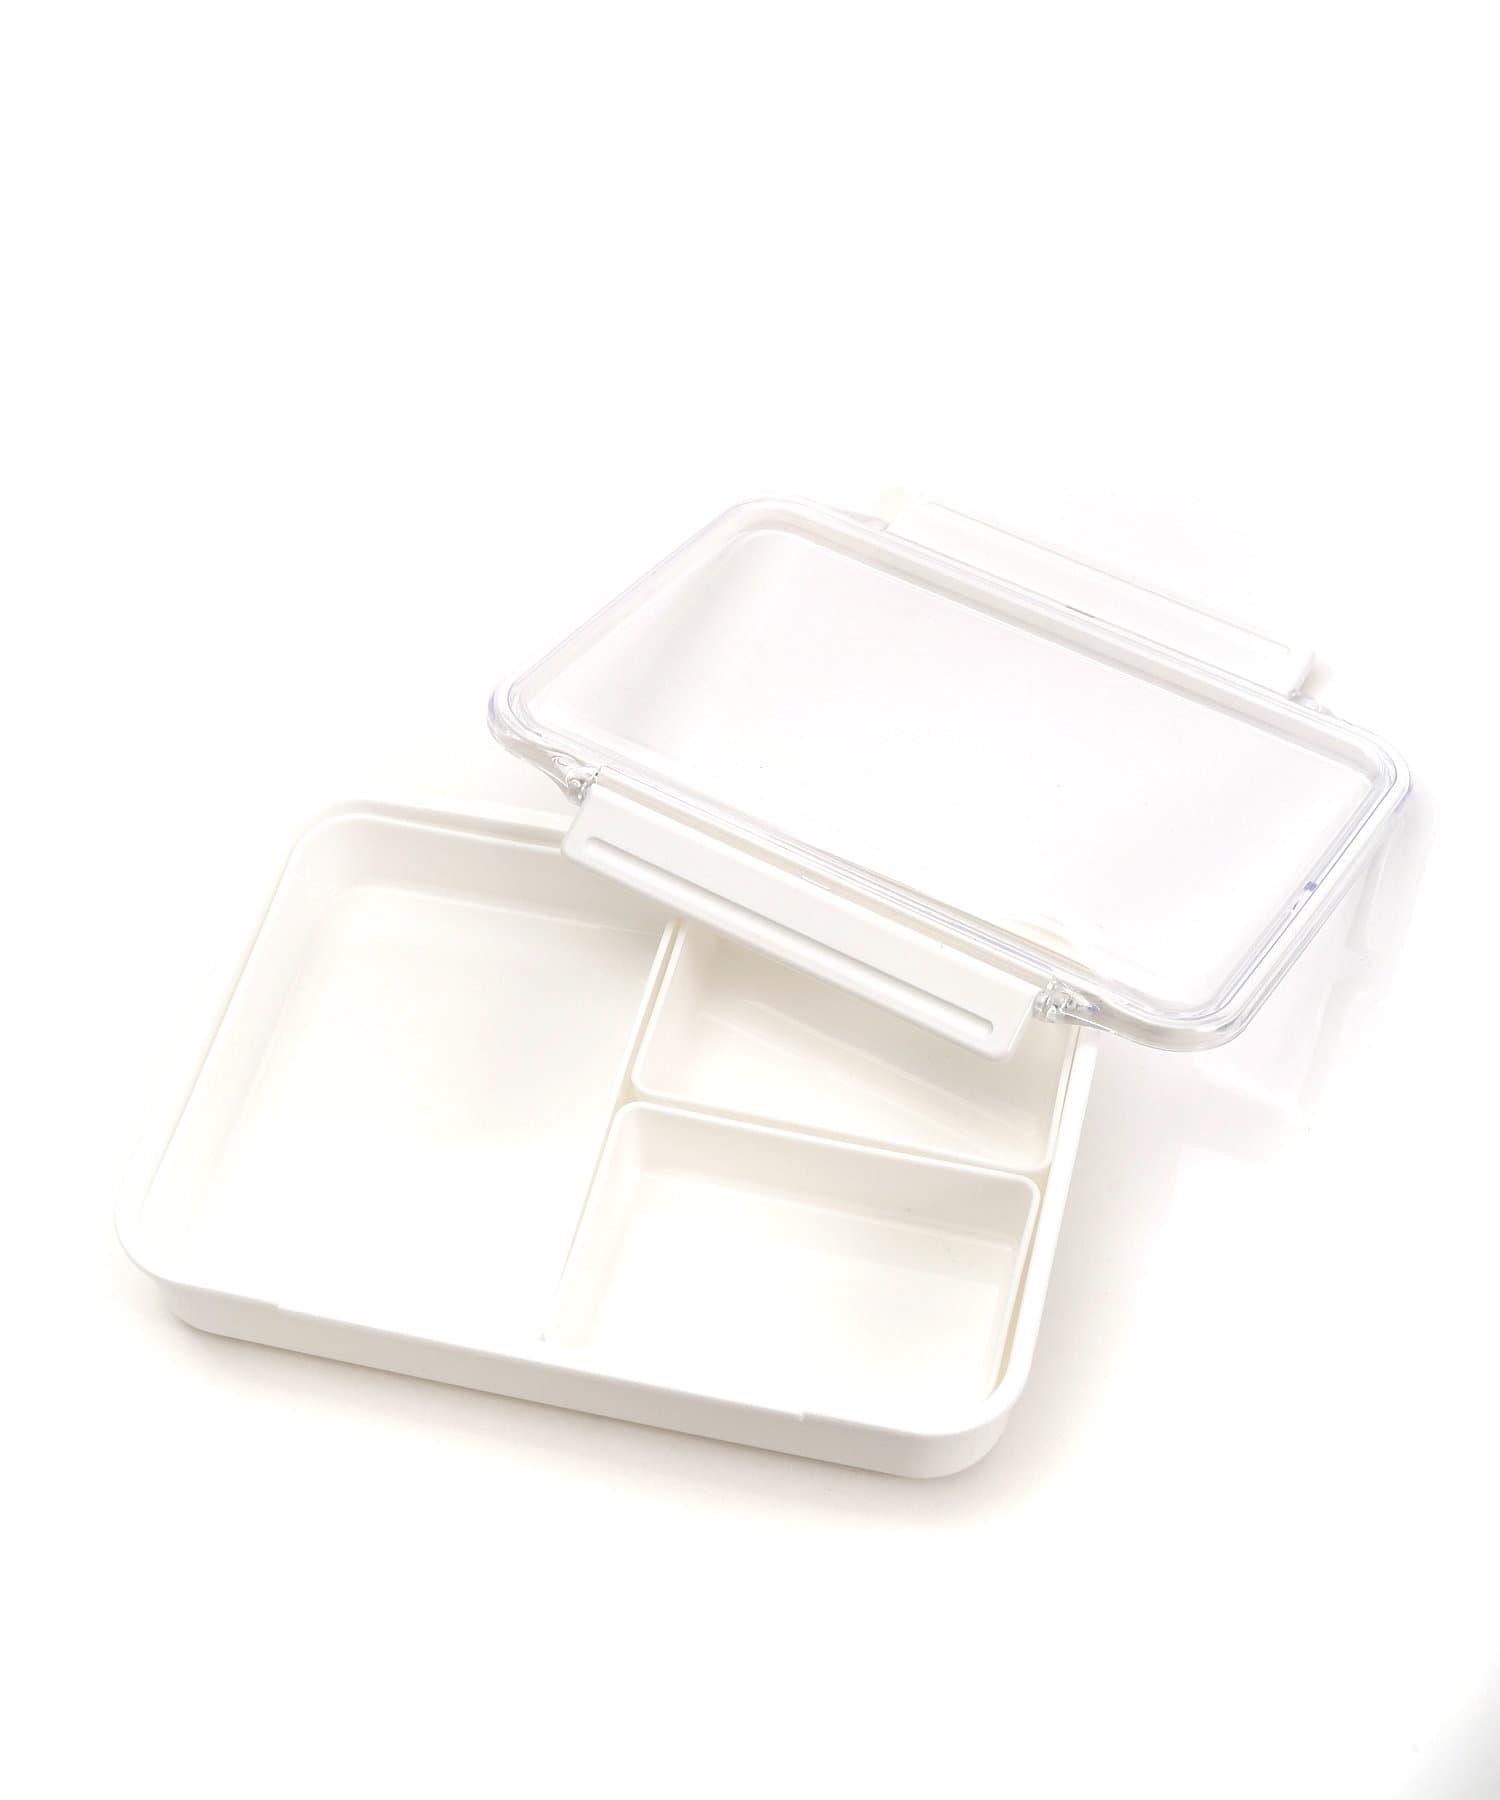 3COINS(スリーコインズ) ホーム 【選んで楽しい】仕切カップ付ランチボックスL ホワイト